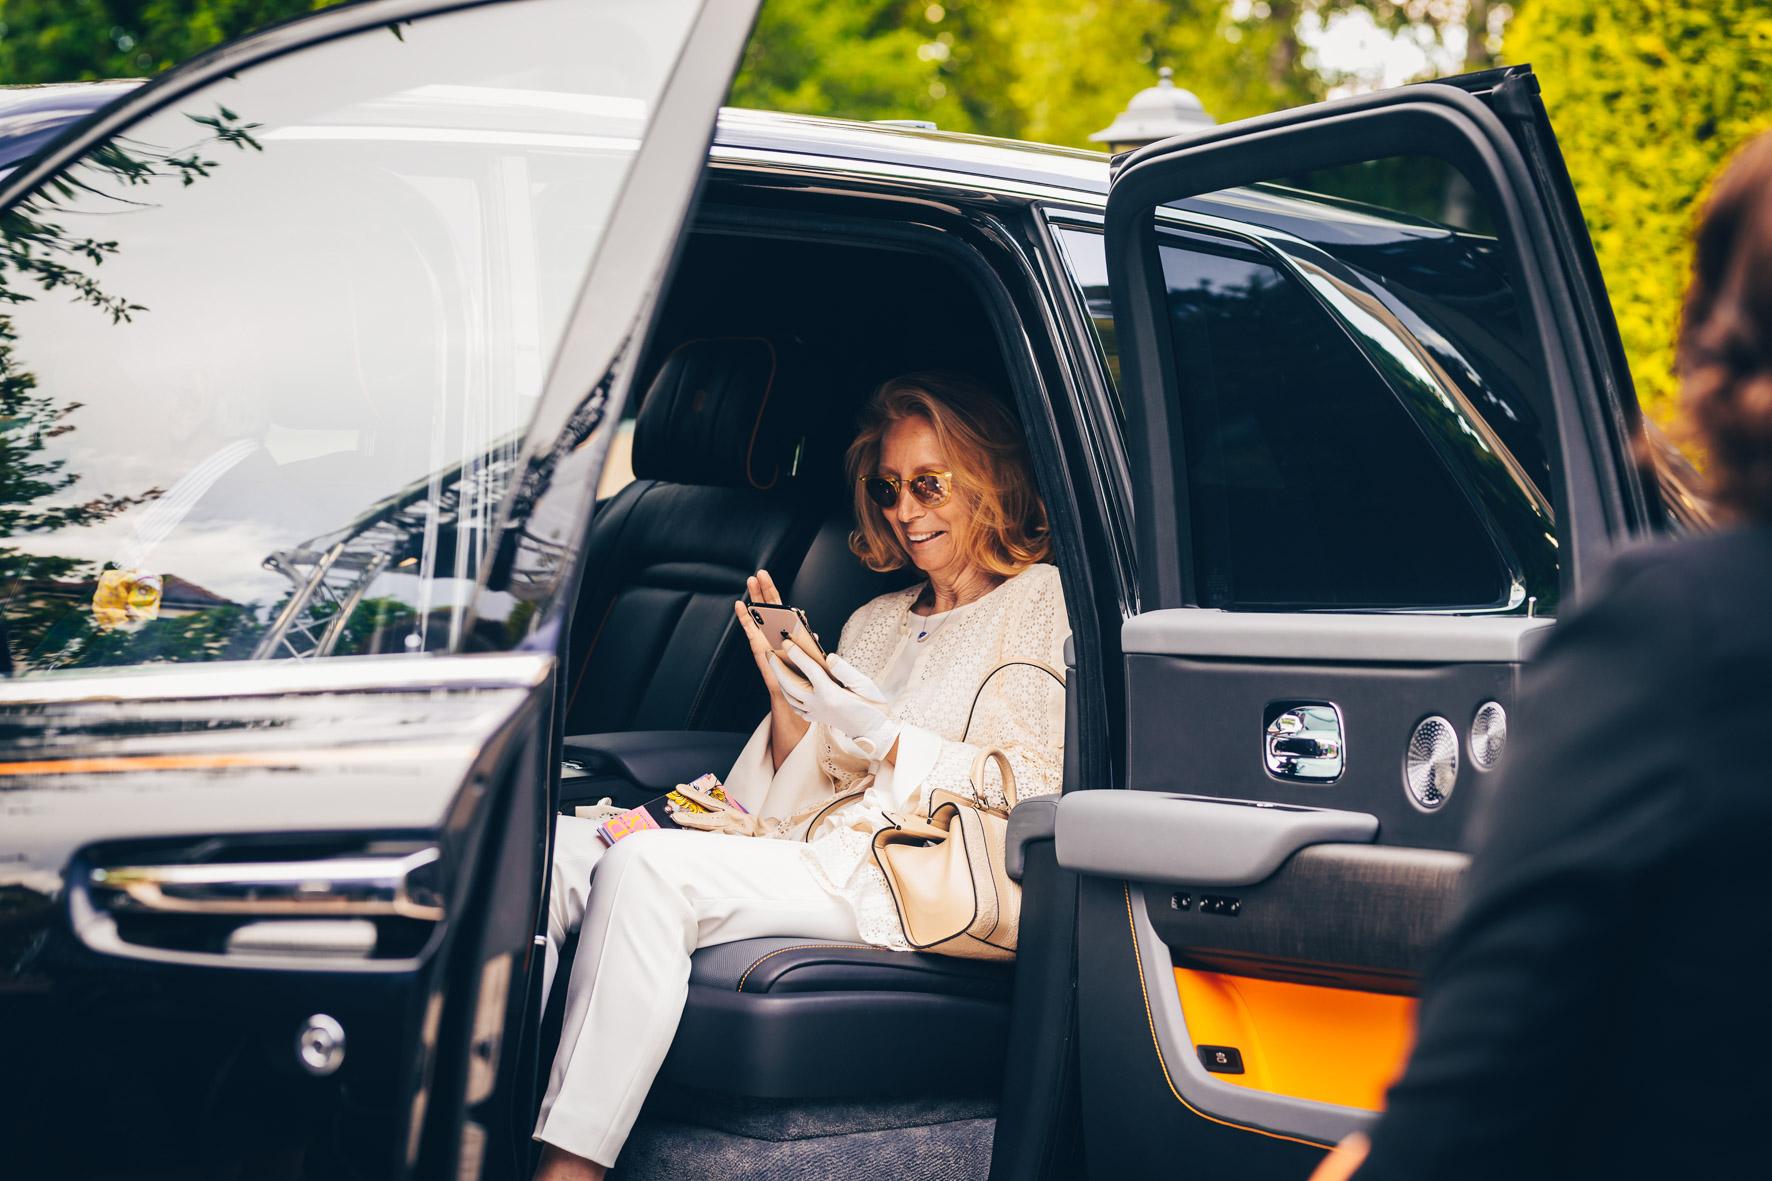 Konrad-lifestyle-art-basel-%22rollsroyce%22-2019-33.jpg